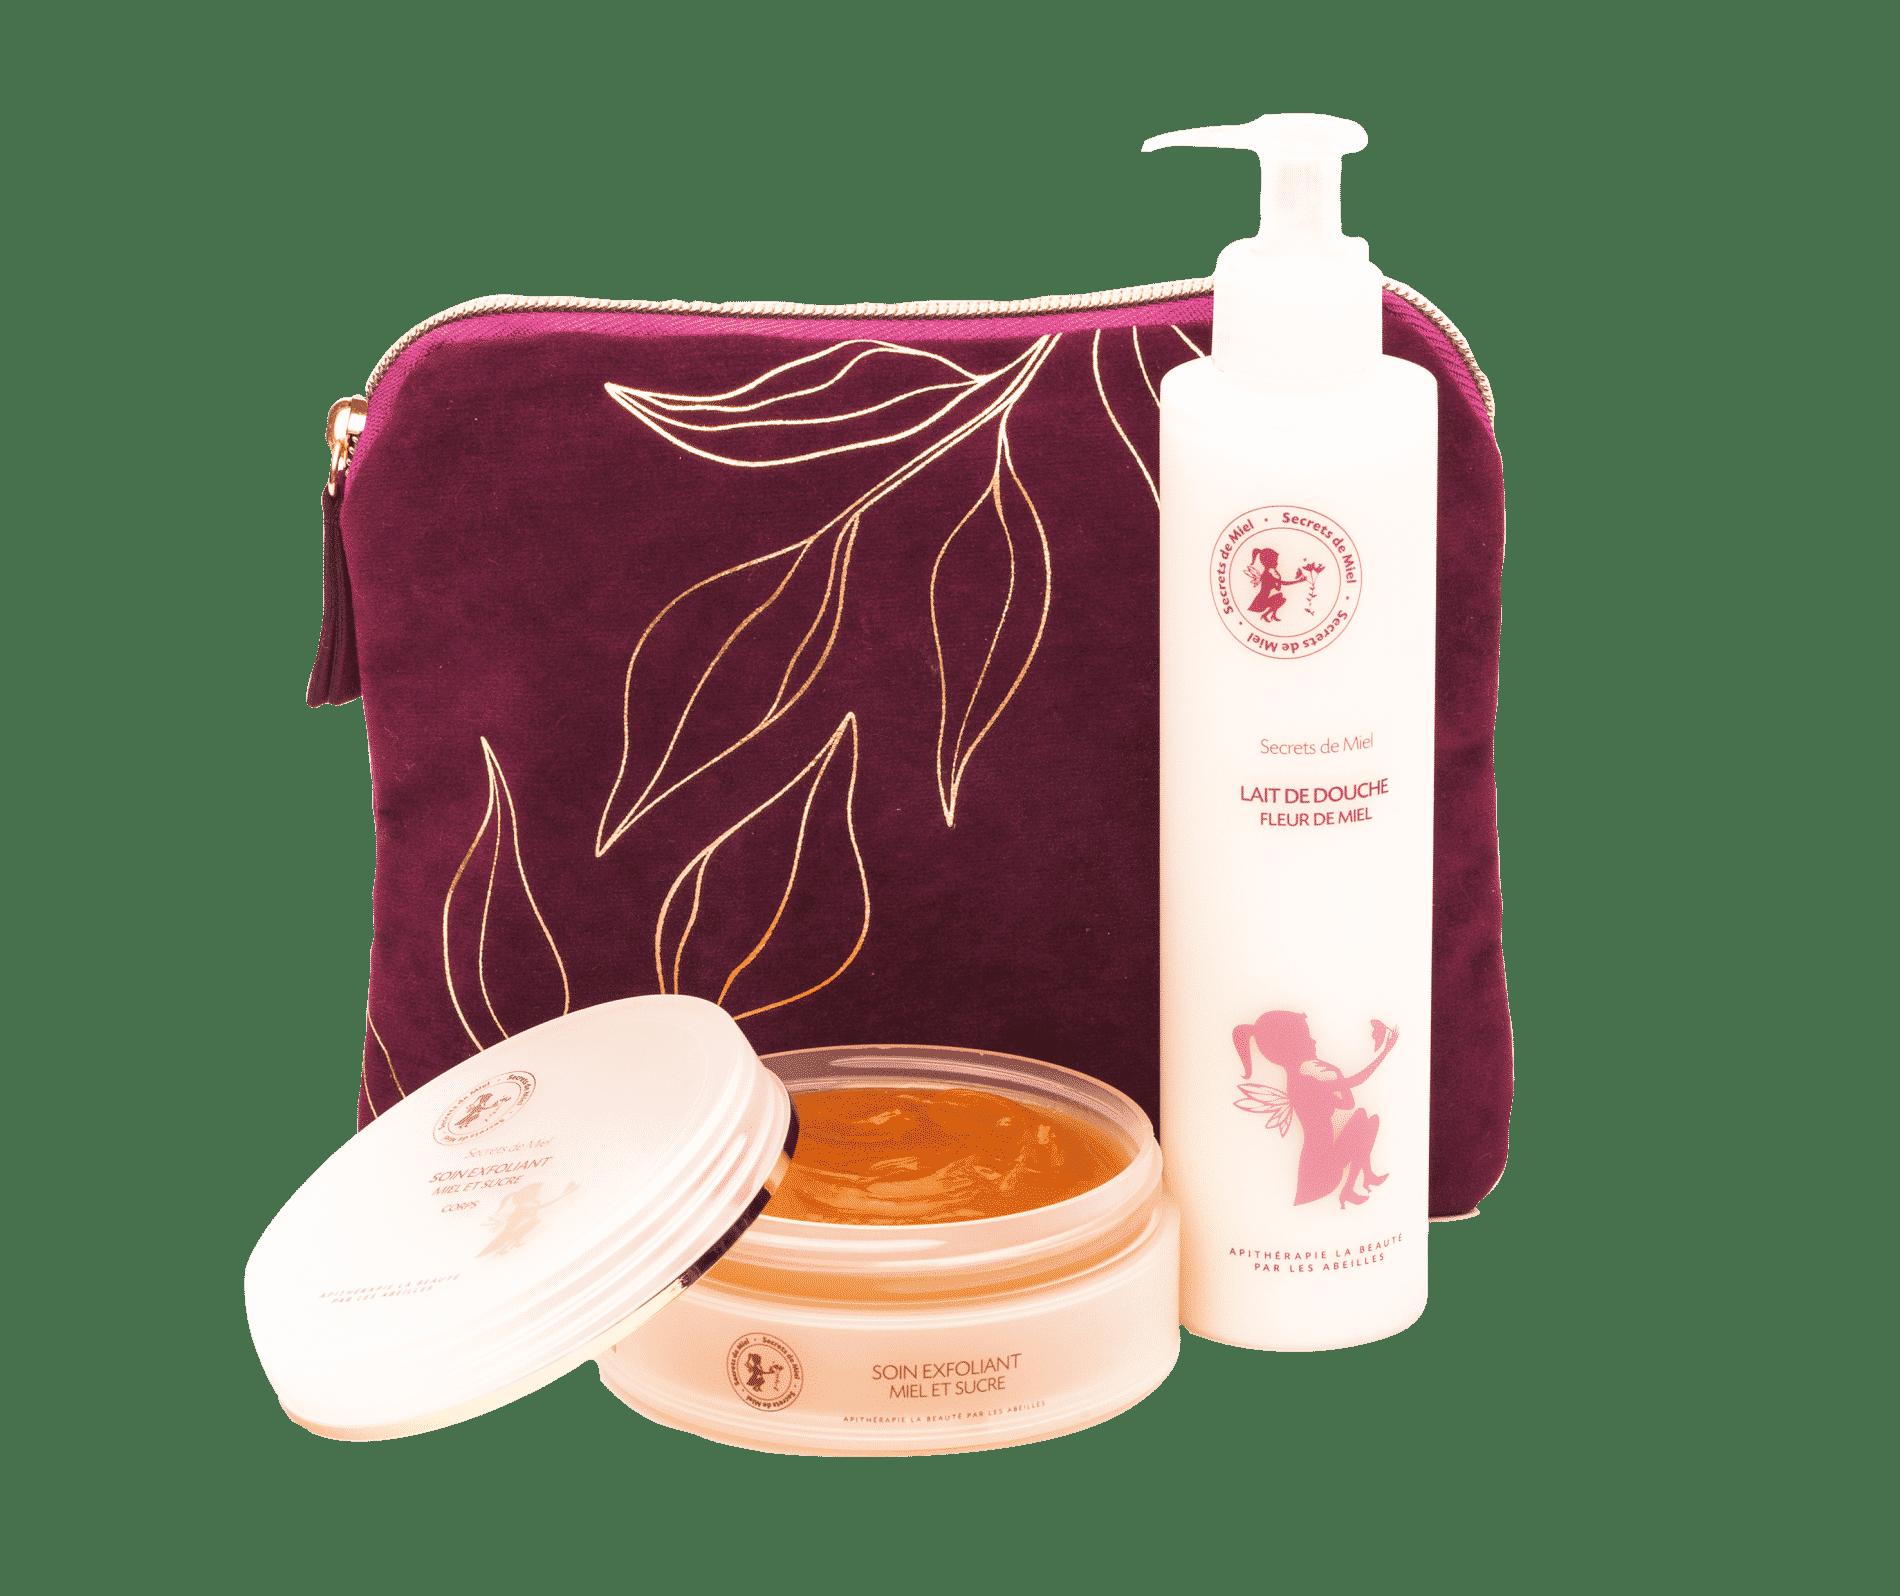 bain - produits bain - coffret - Noël - Secrets de Miel